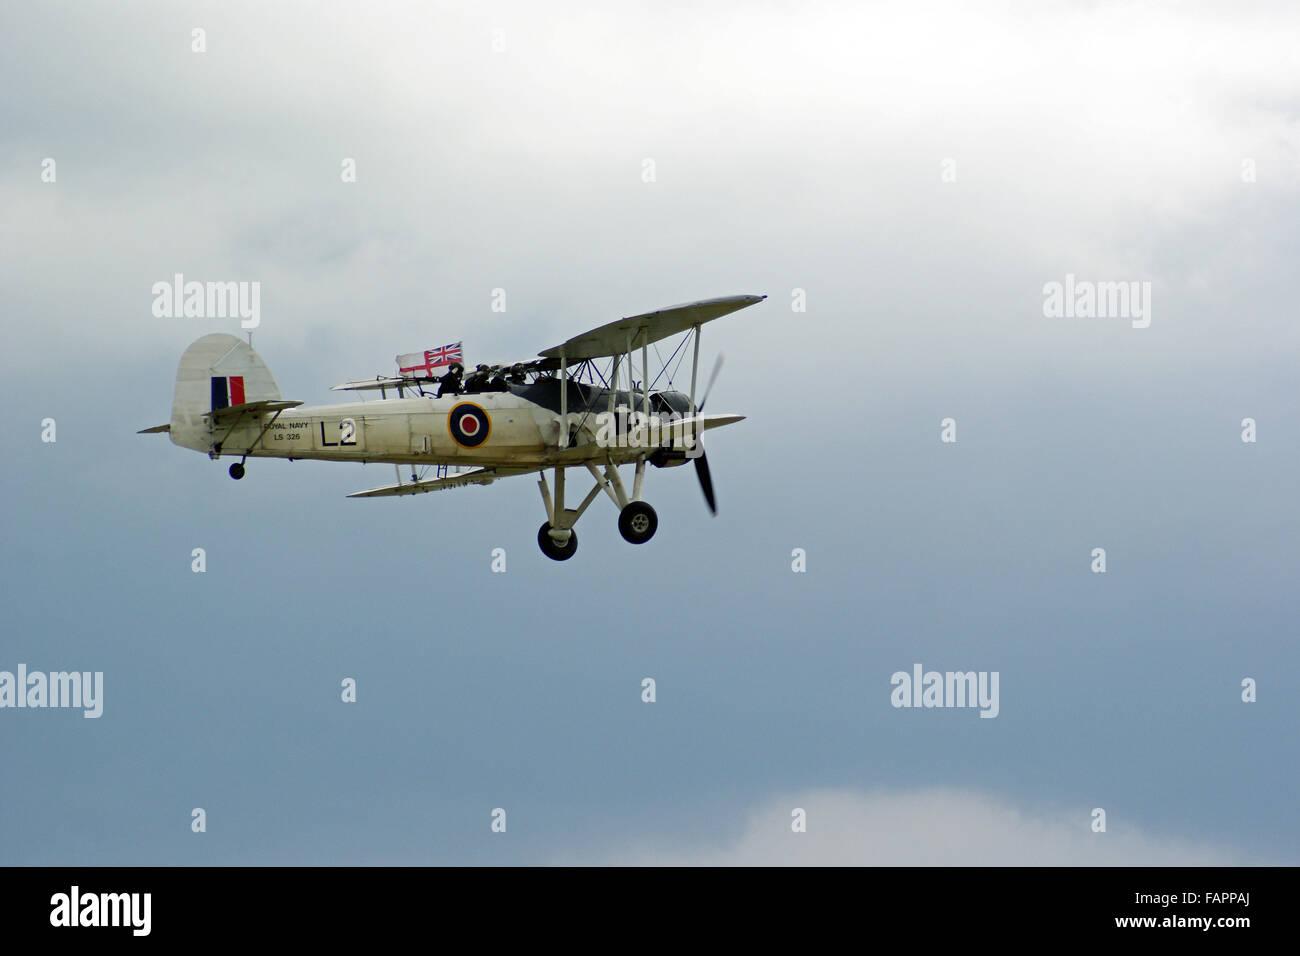 Fairey Swordfish in flight with Union Flag - Stock Image